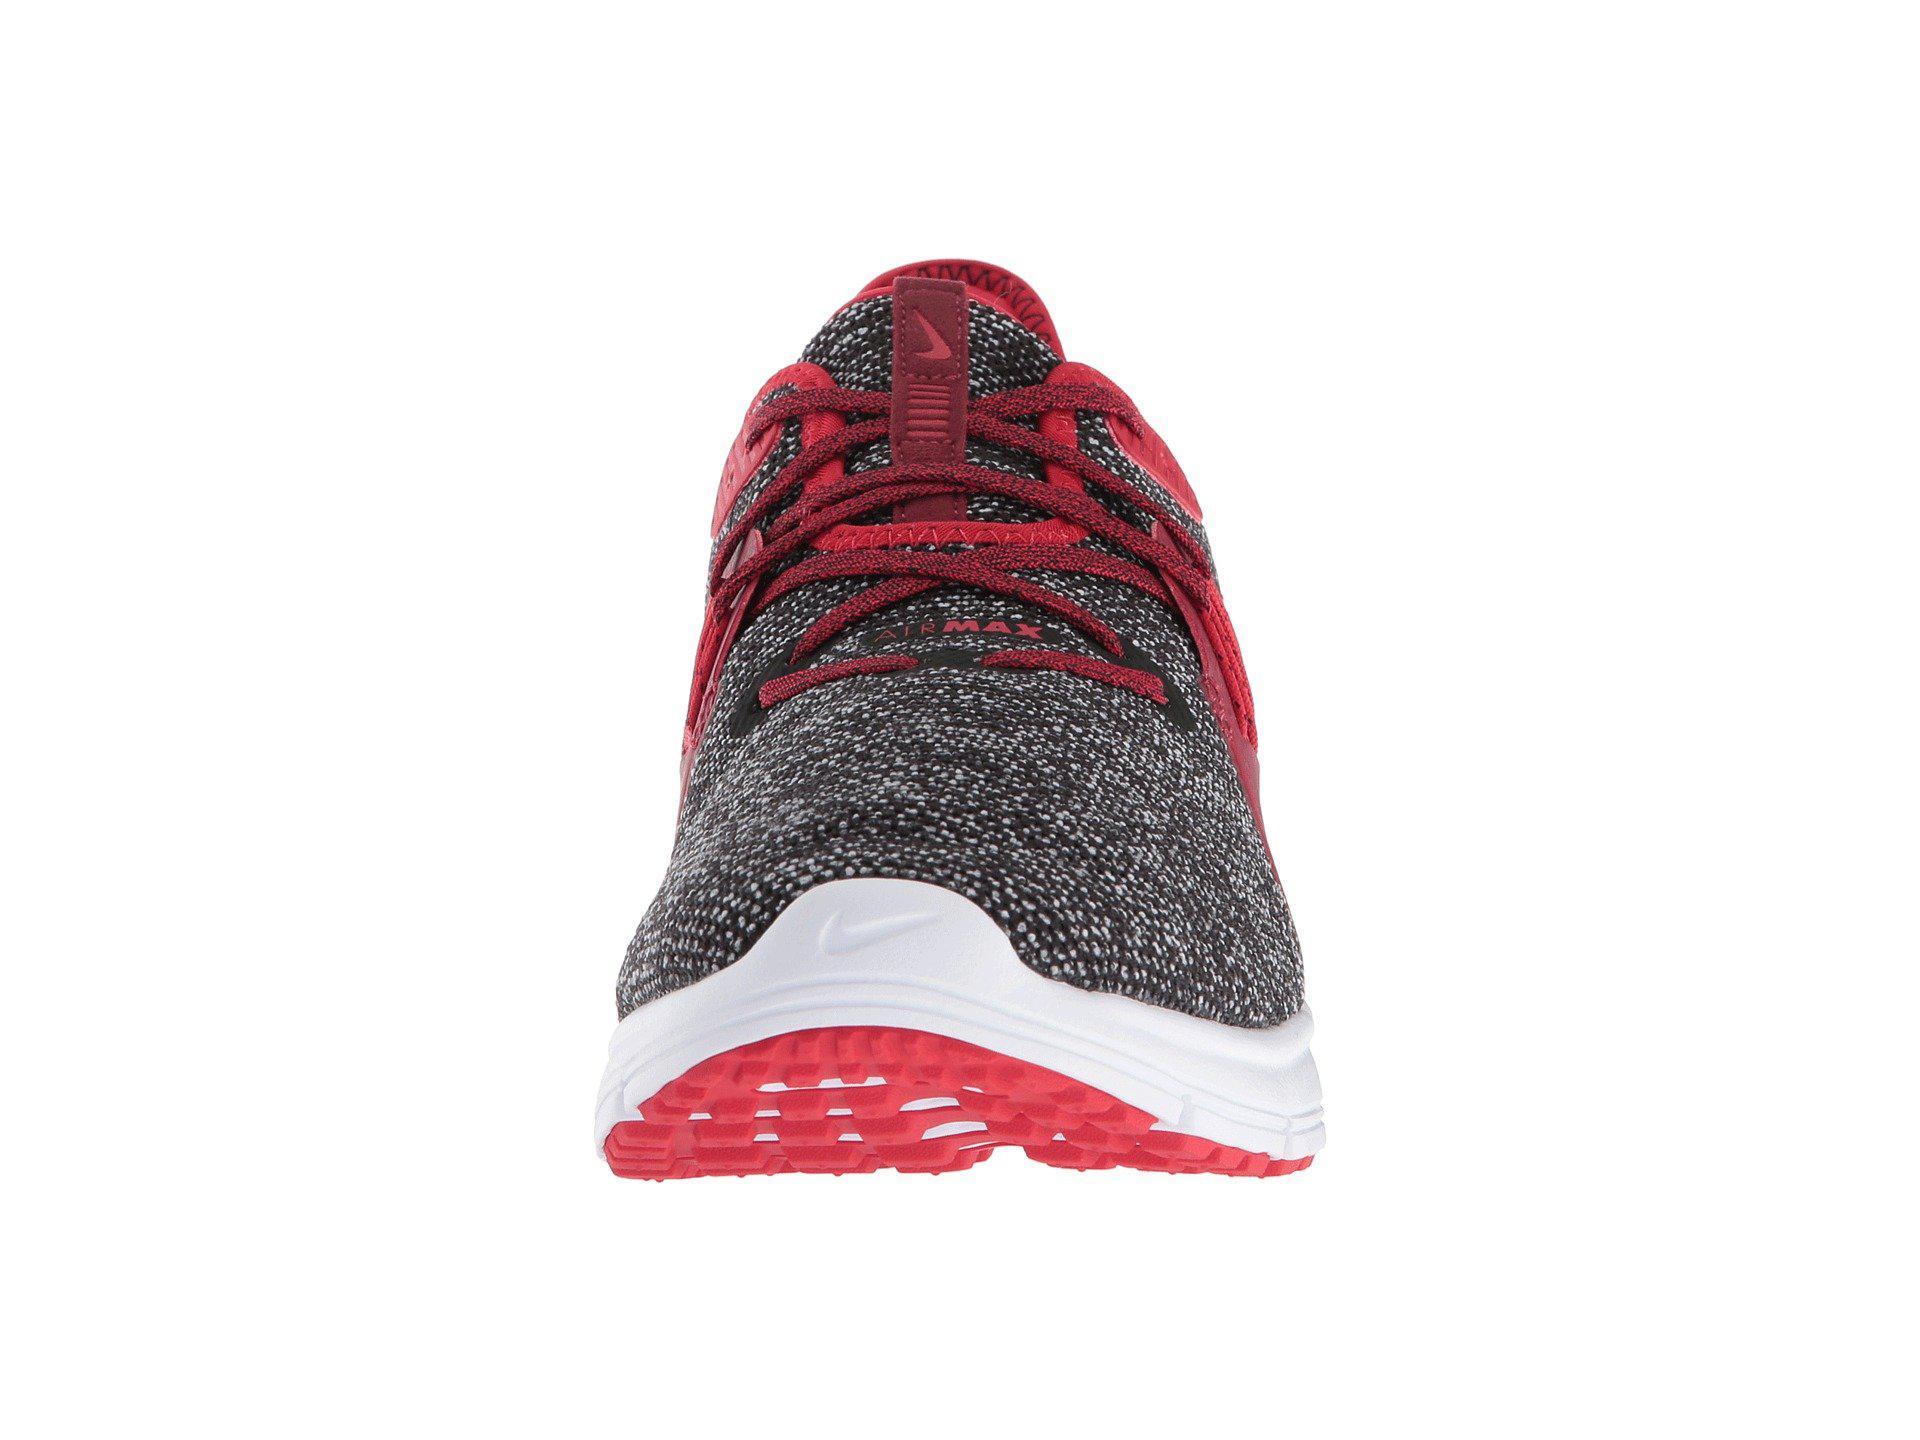 fb0de7a6f8 Nike - Red Air Max Sequent 3 for Men - Lyst. View fullscreen